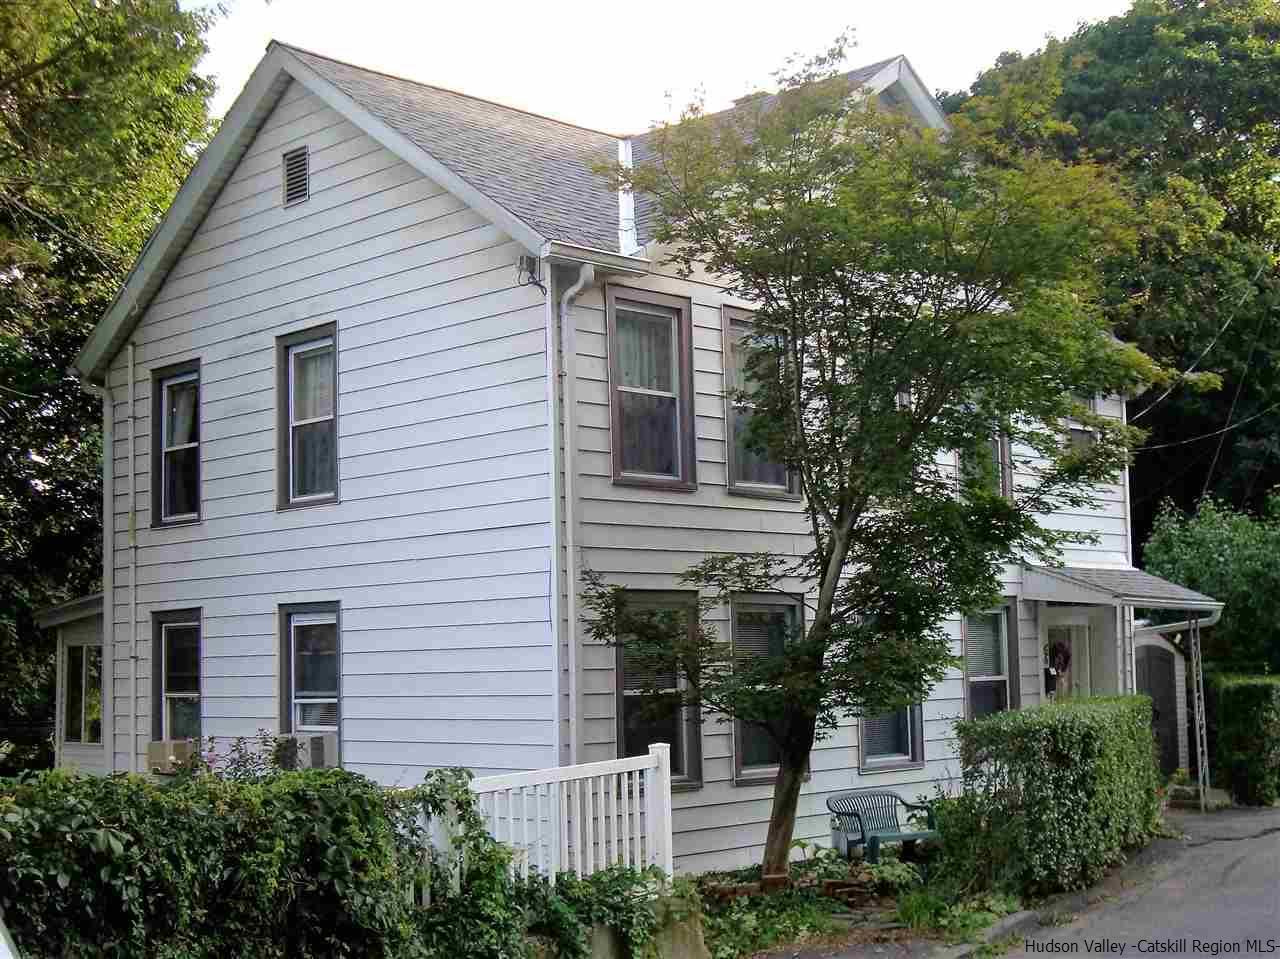 66 Spruce St, Kingston, NY 12401